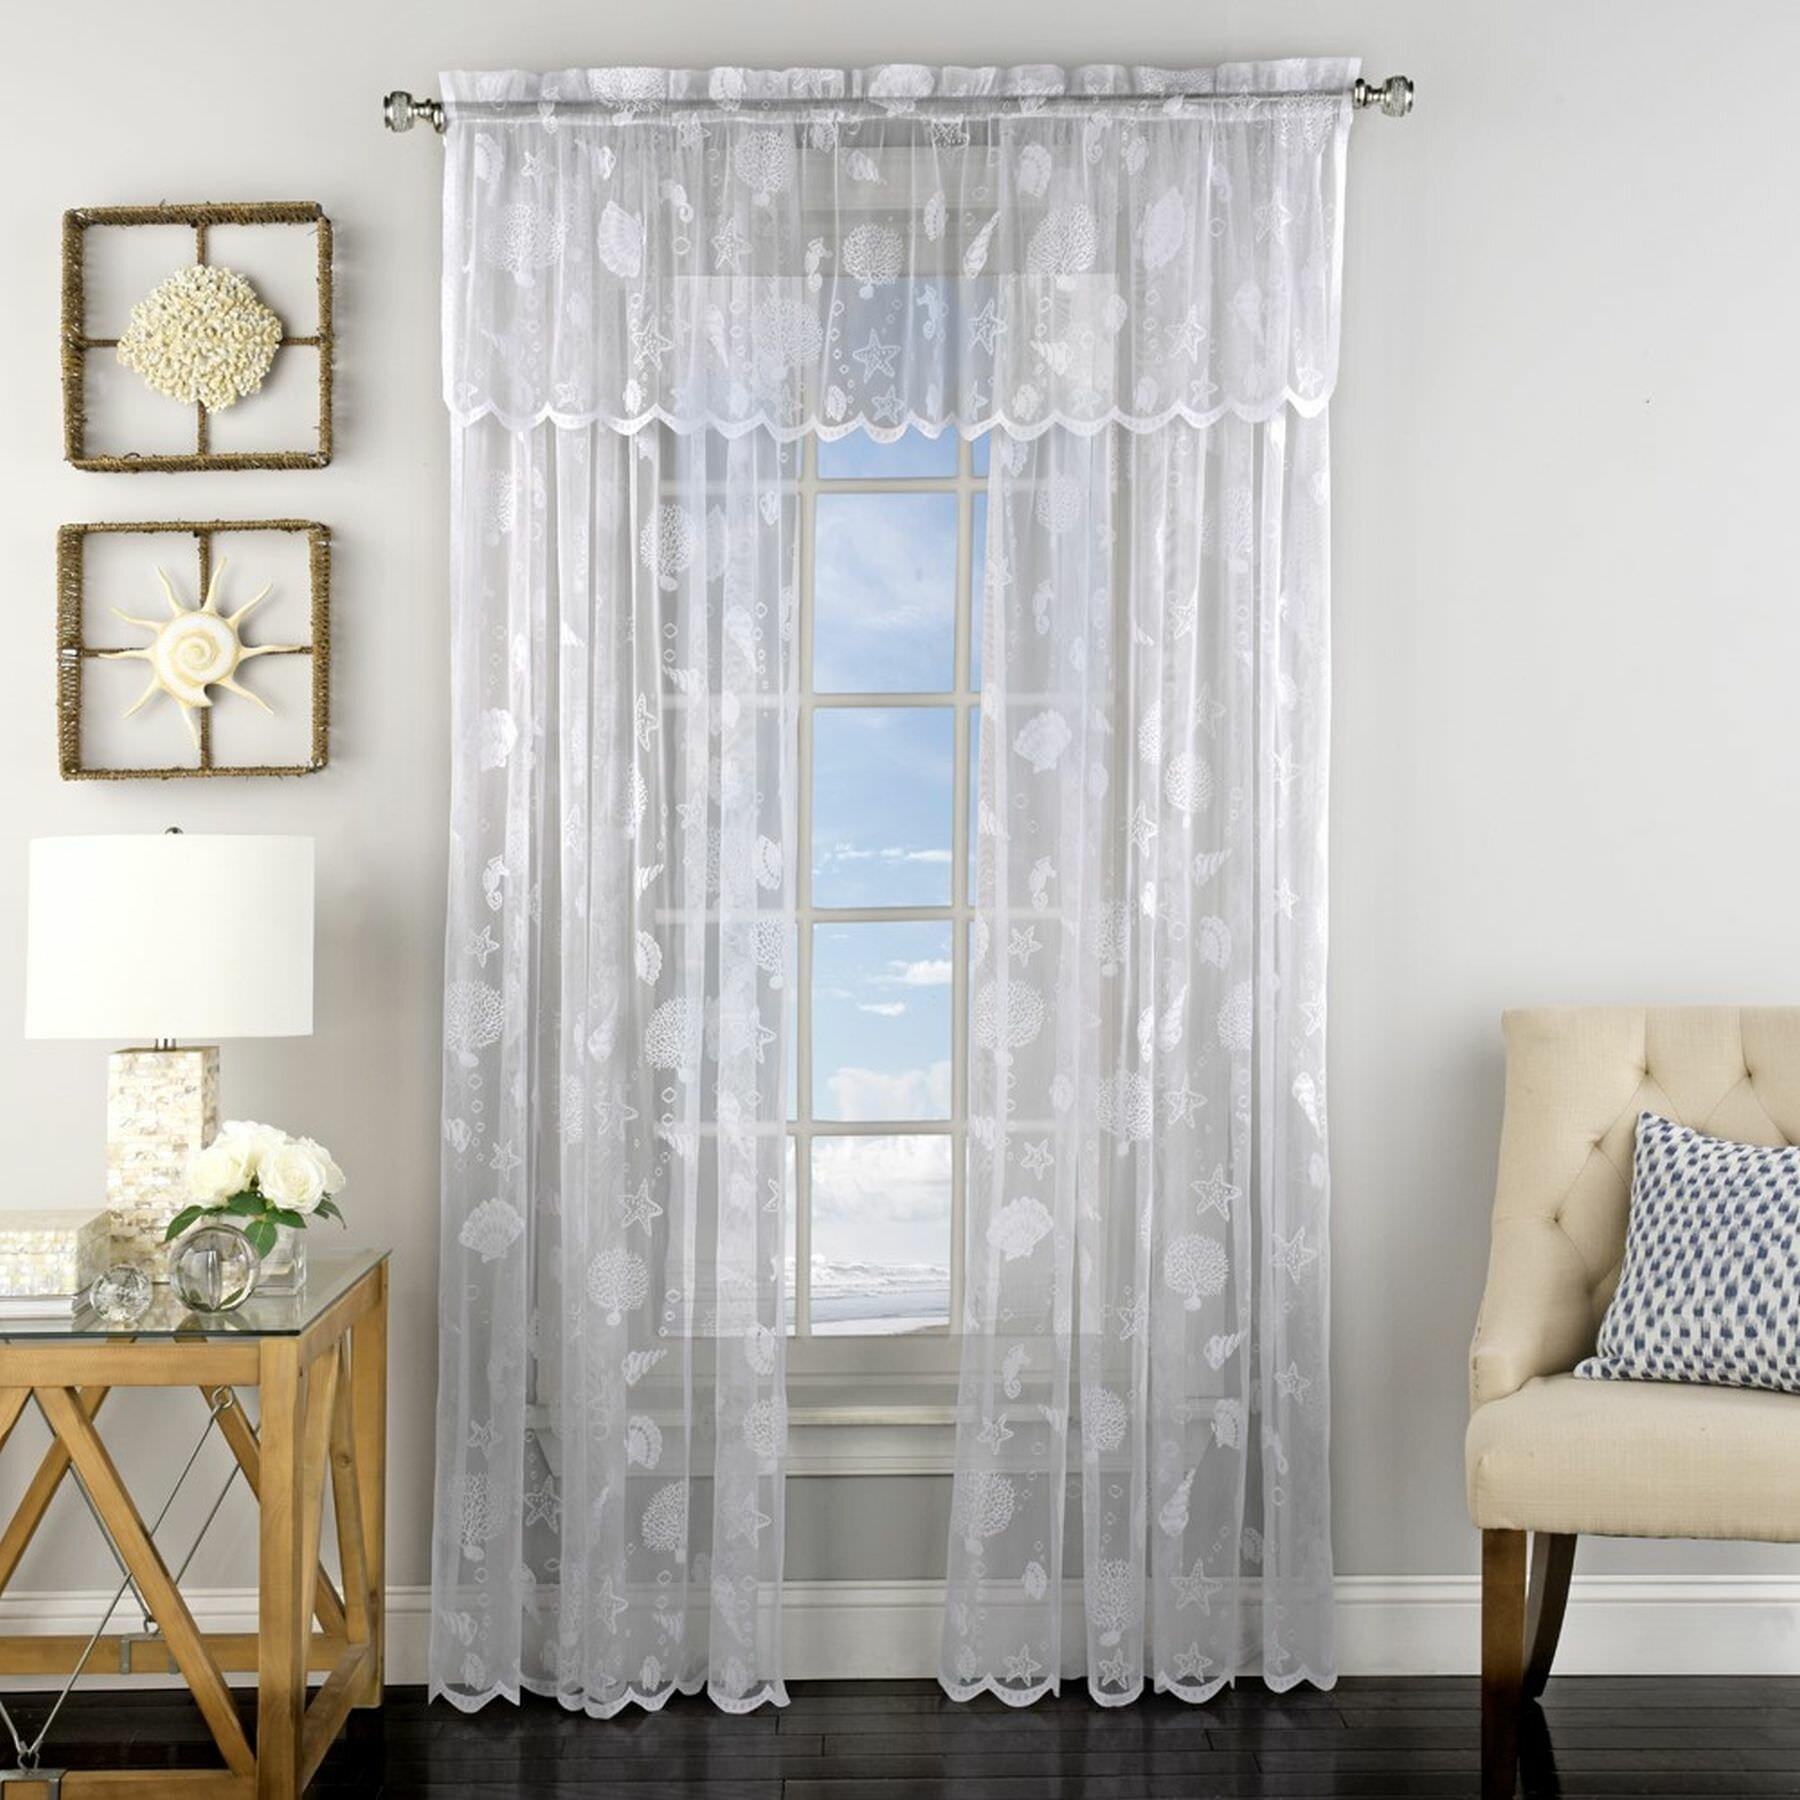 Highland Dunes Antonella Corales De Marina Knitted Jacquard Lace Window Semi Sheer Single Curtain Panel Reviews Wayfair